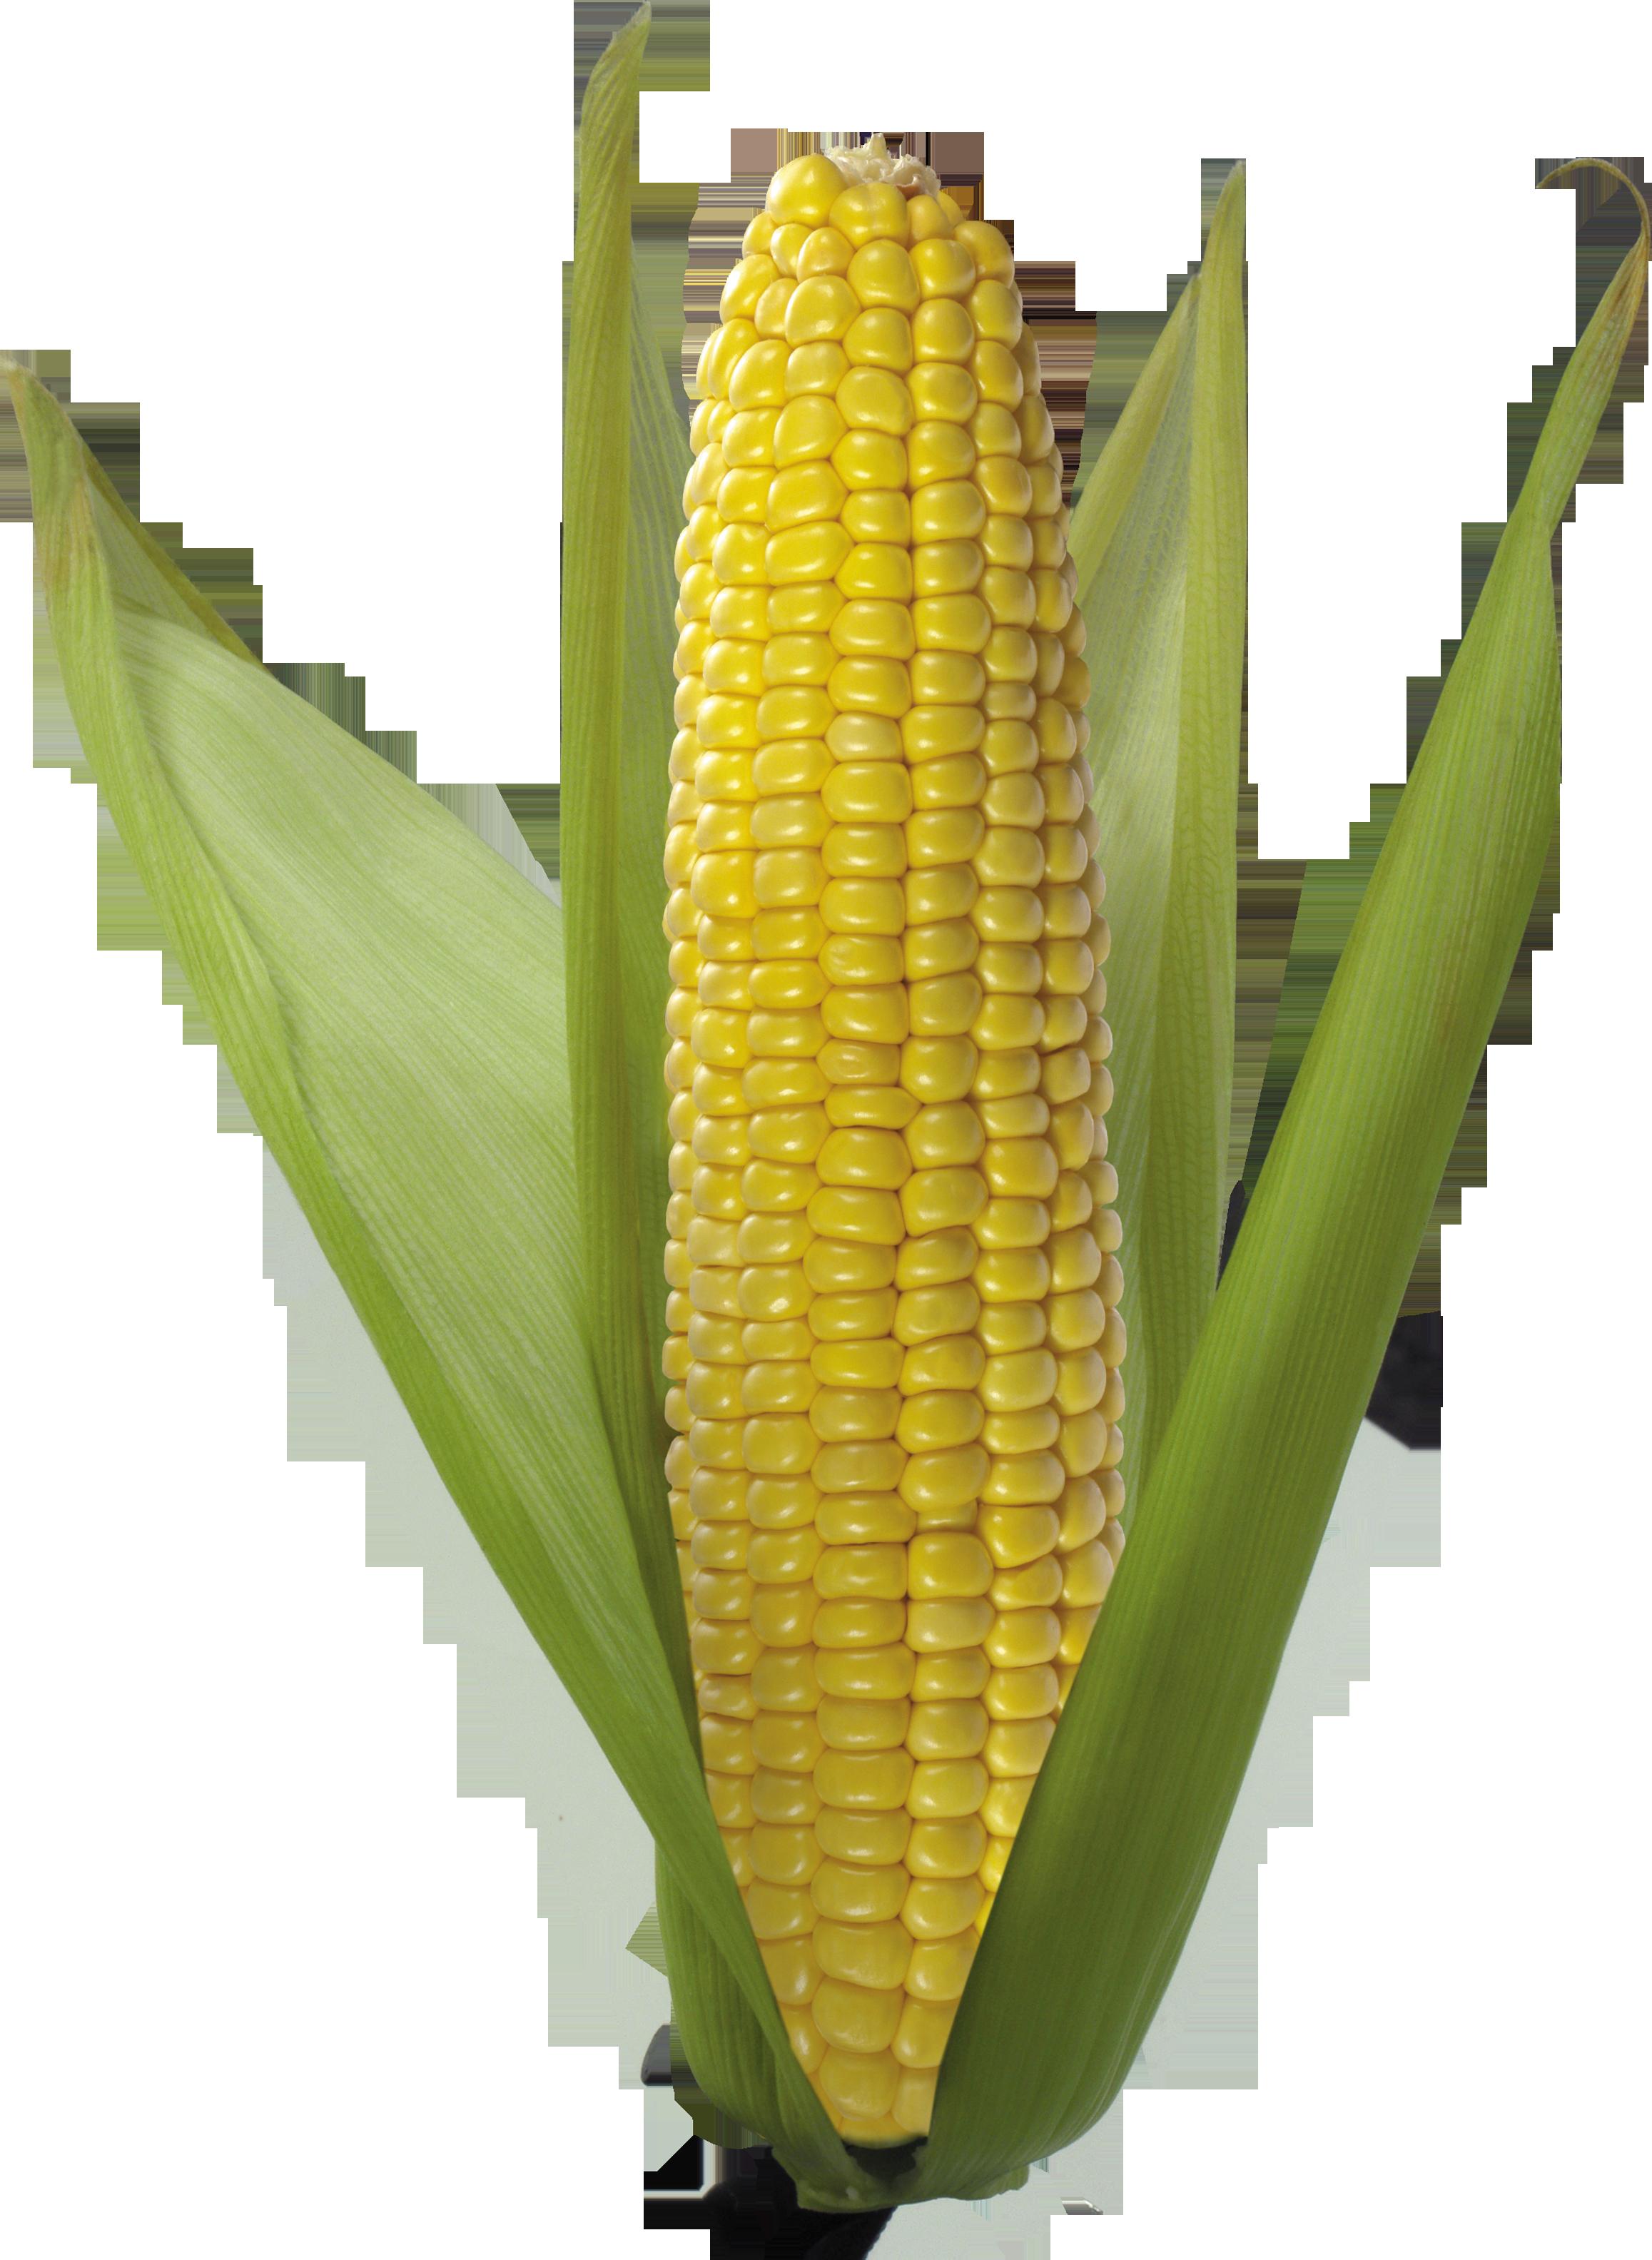 White background images all. Grains clipart corn grain